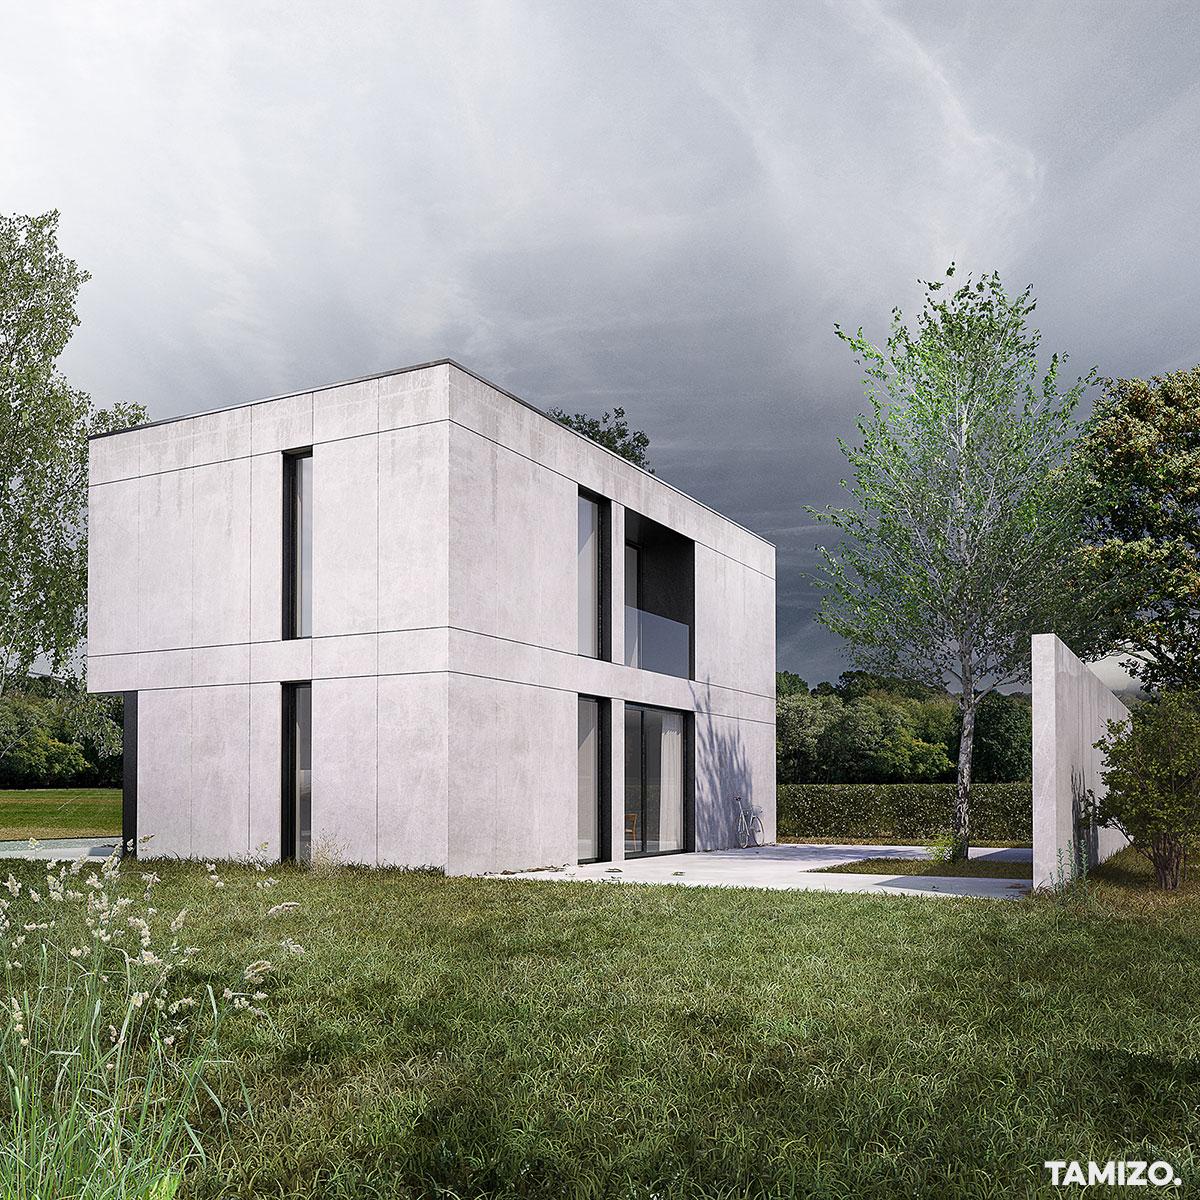 A063_tamizo_architects_mateusz_kuo_stolarski_dom_projekt_wojtka_pabianice_maly_domek_06